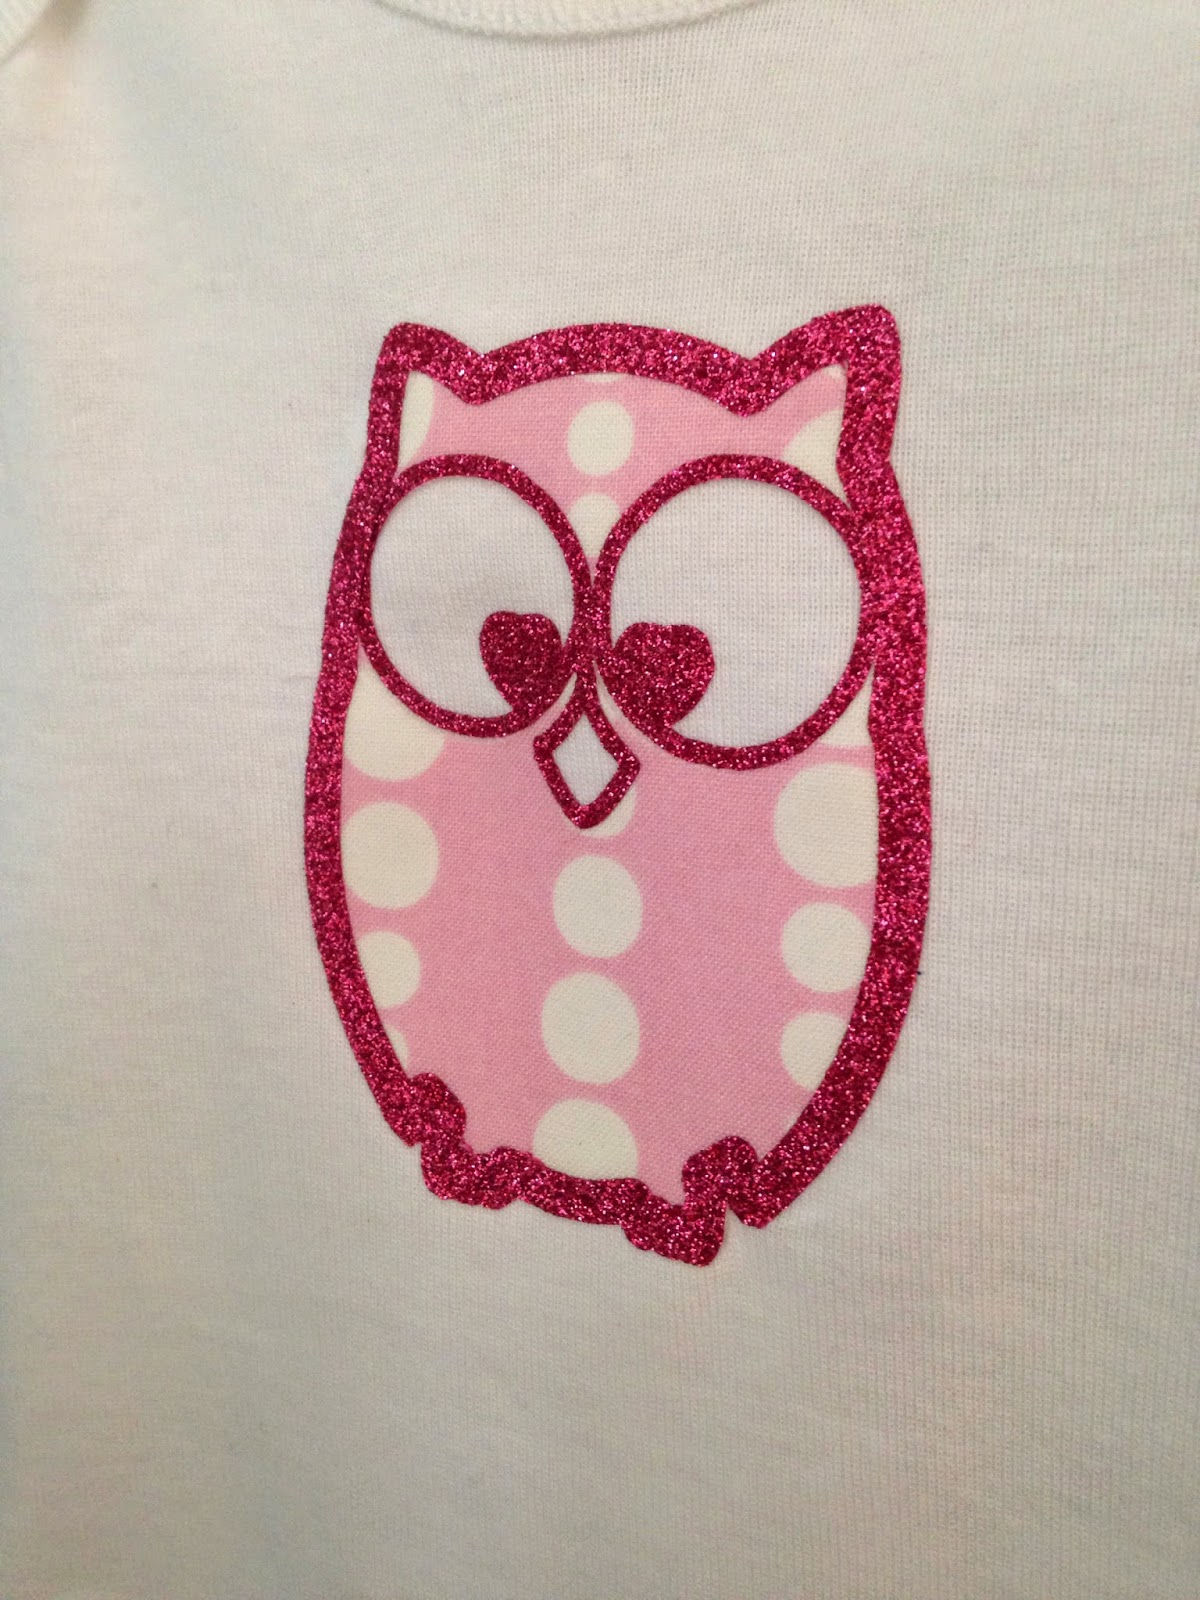 Silhouette tutorial, fabric, glitter HTV, glitter heat transfer vinyl, Silhouette Studio, owl, onesie